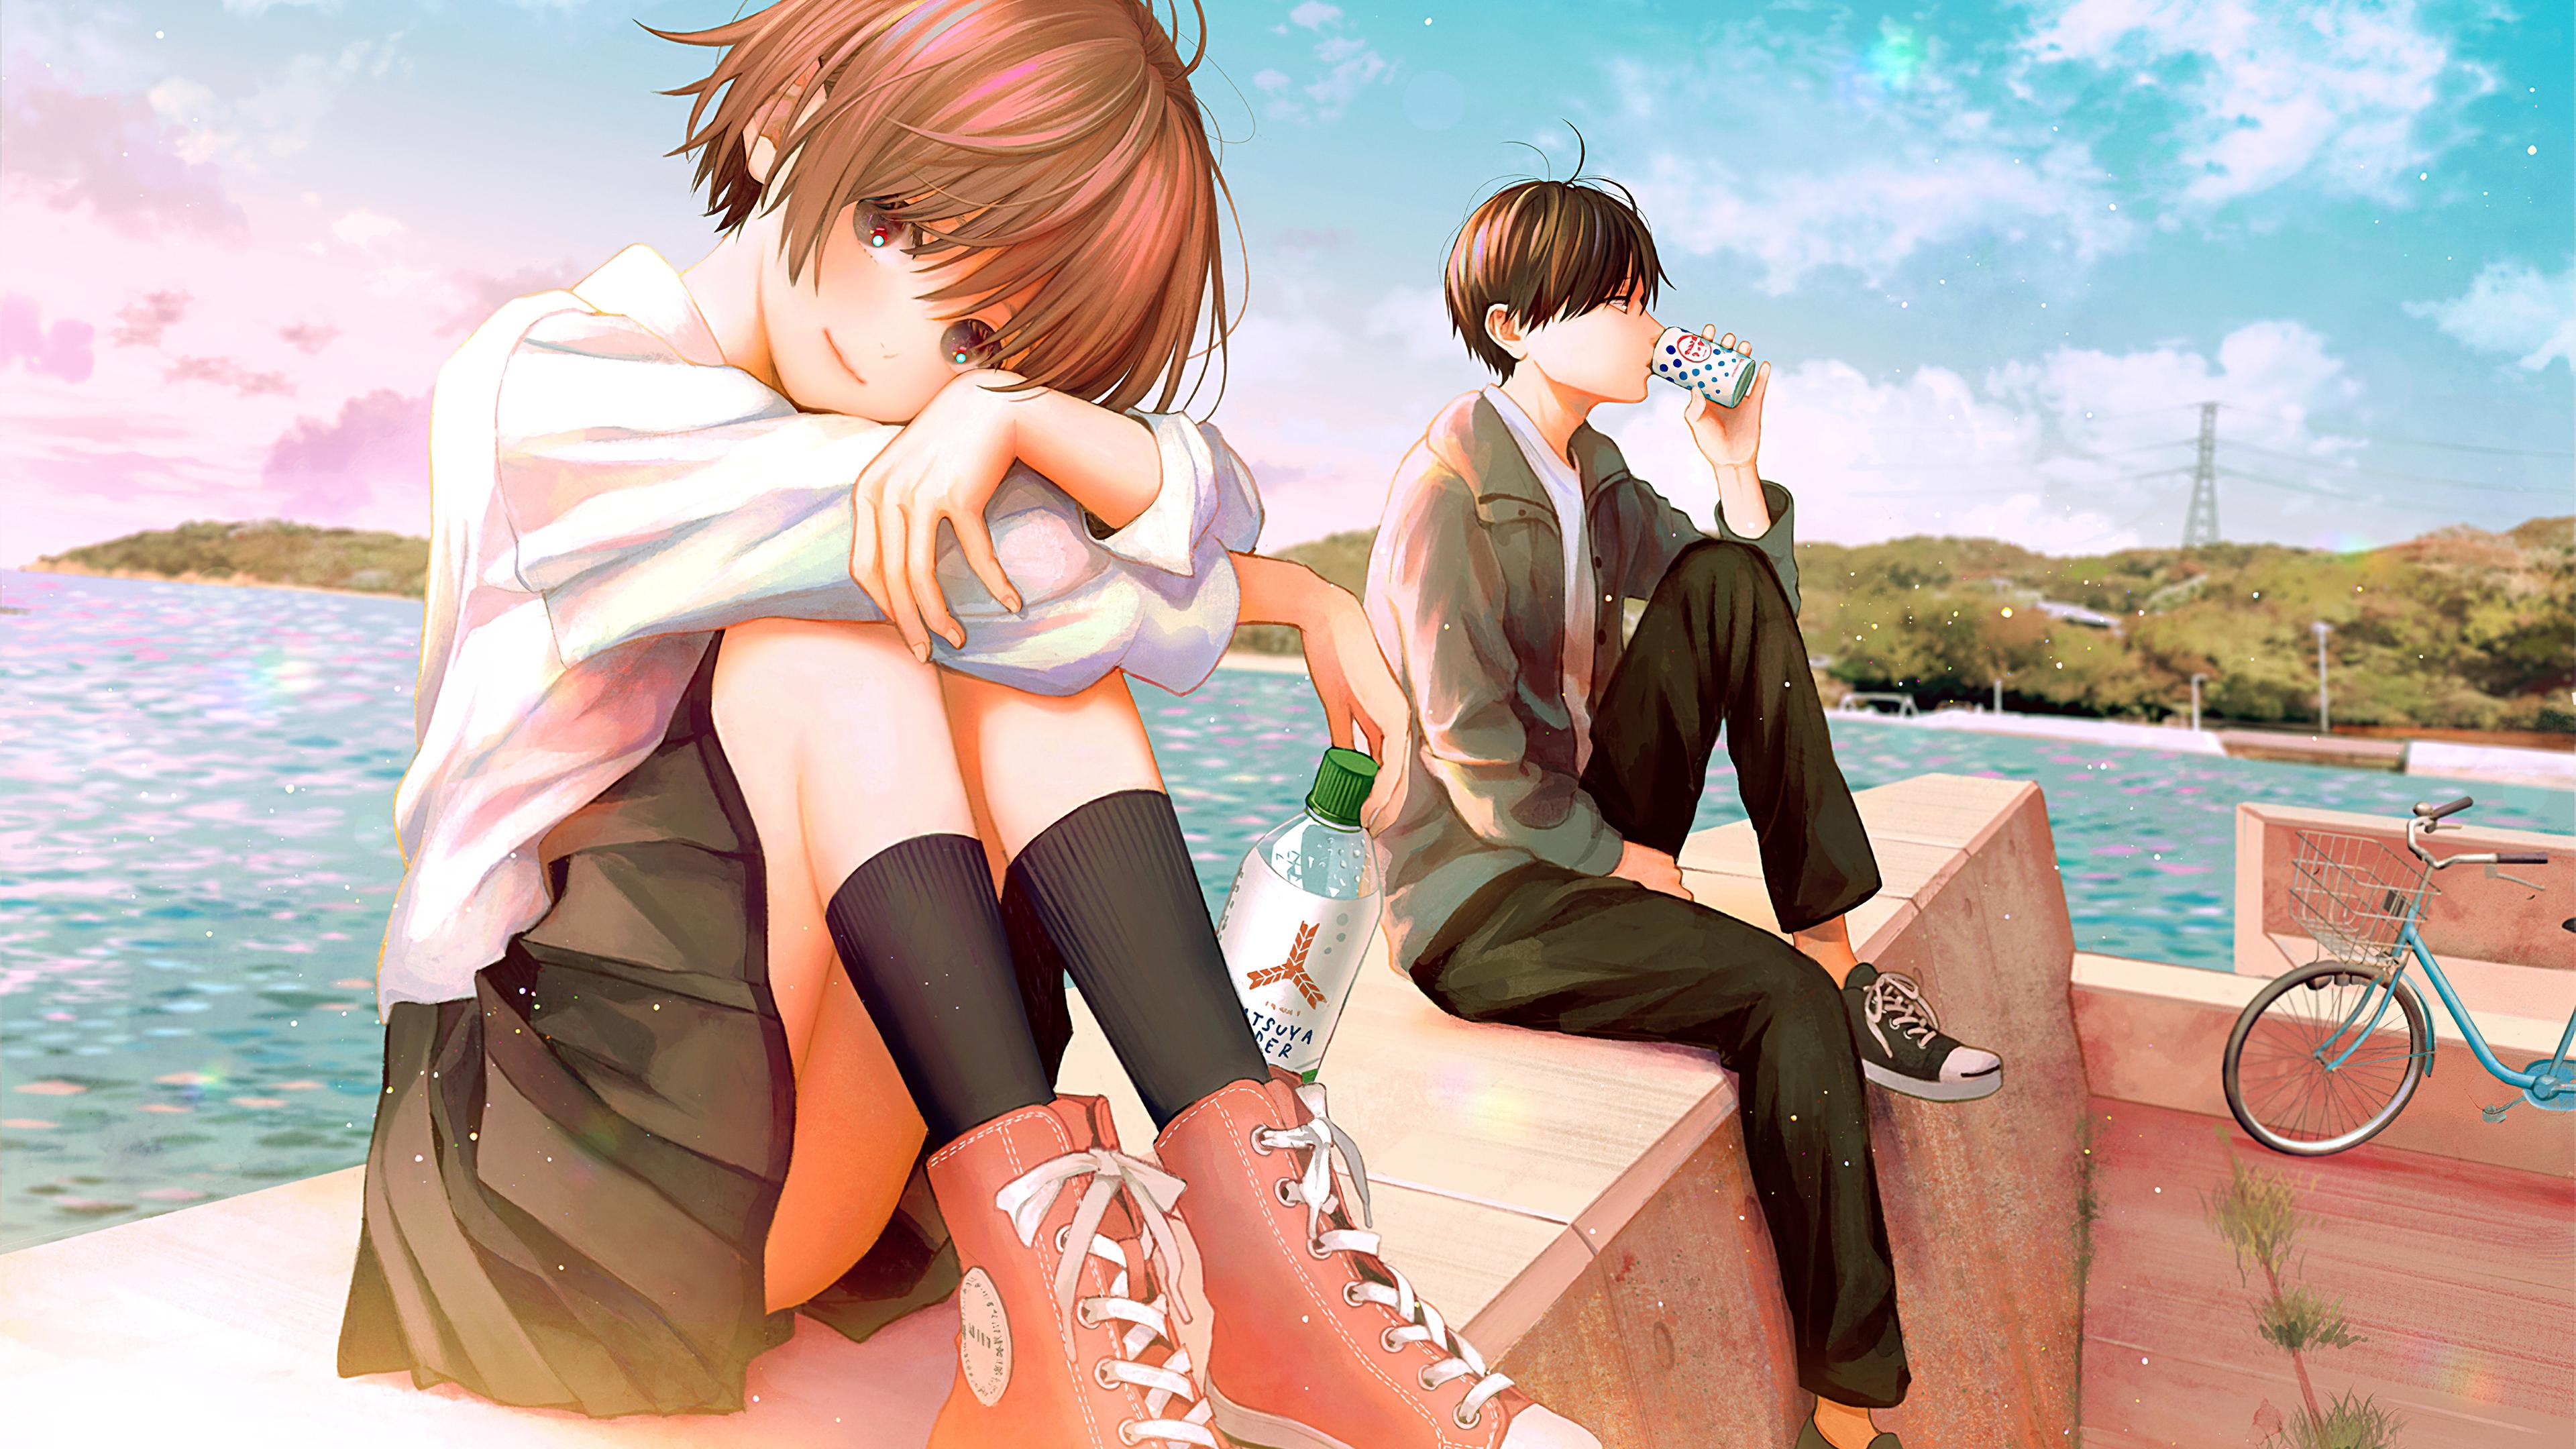 3840x2160 Teenage Anime Couple School Dress 4k 4k HD 4k ...